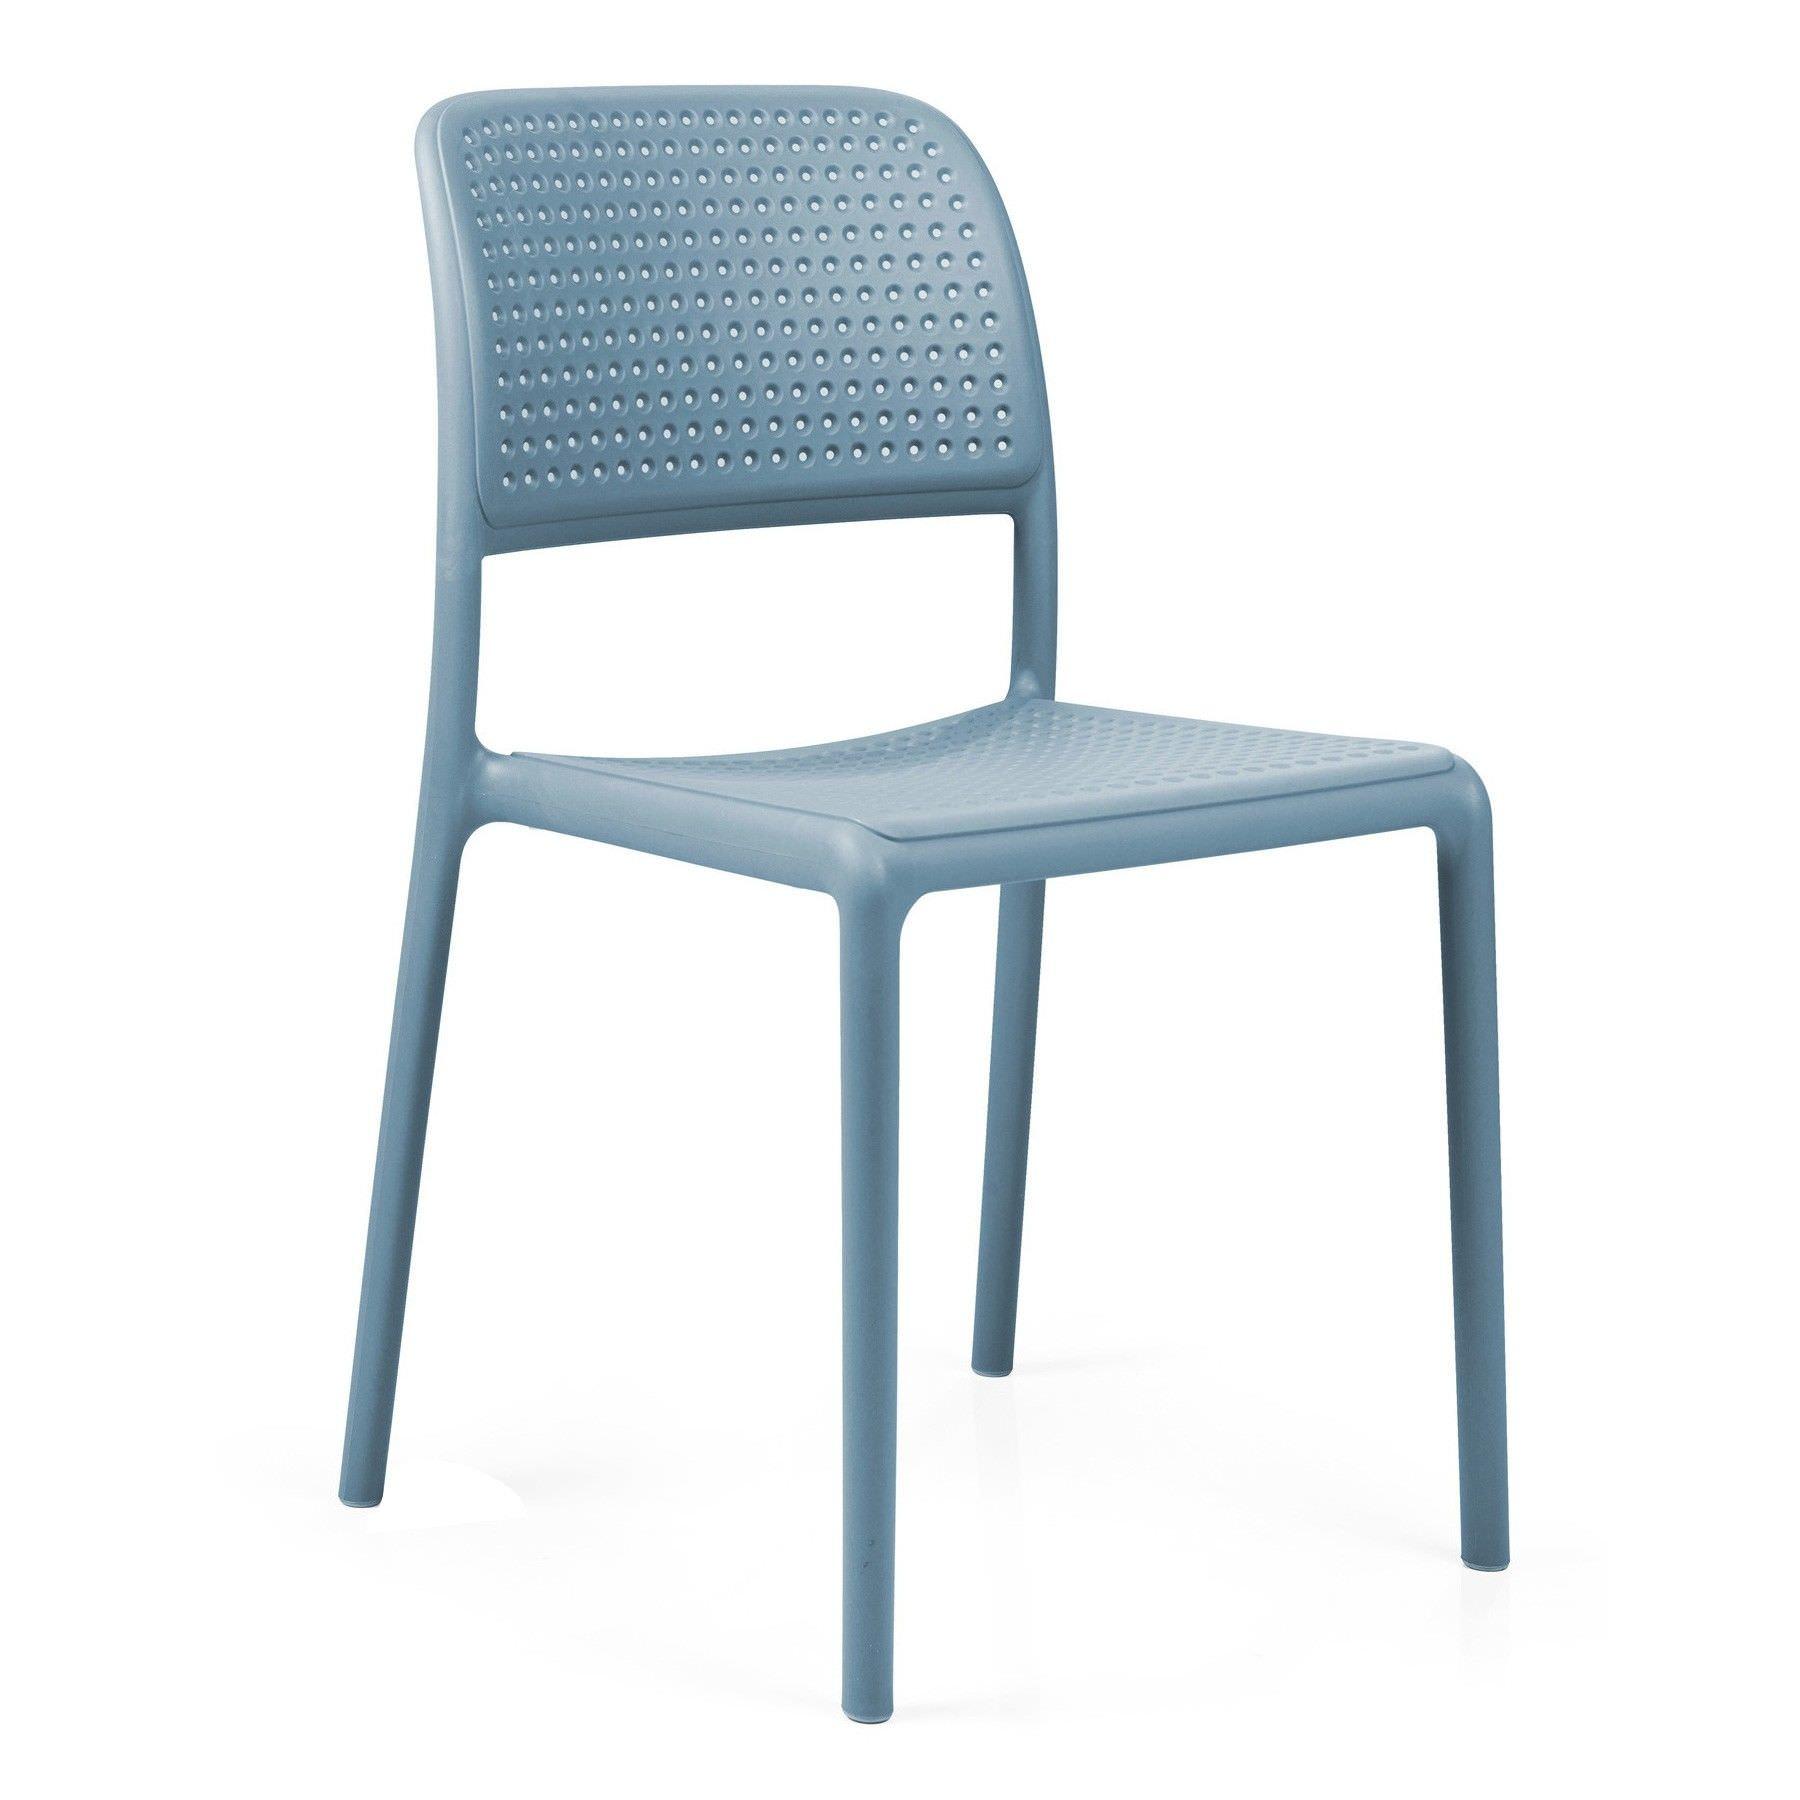 Bora Italian Made Commercial Grade Stackable Indoor/Outdoor Side Chair - Blue